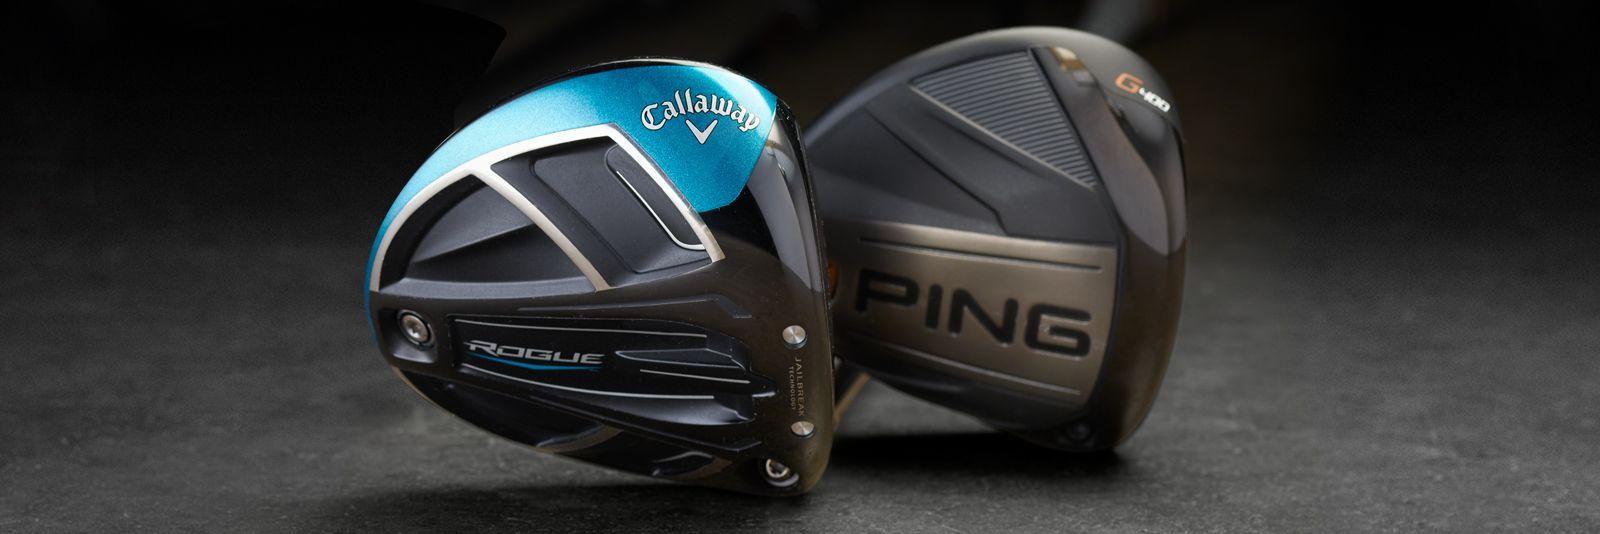 Golf Equipment | Best Price Guarantee at DICK'S